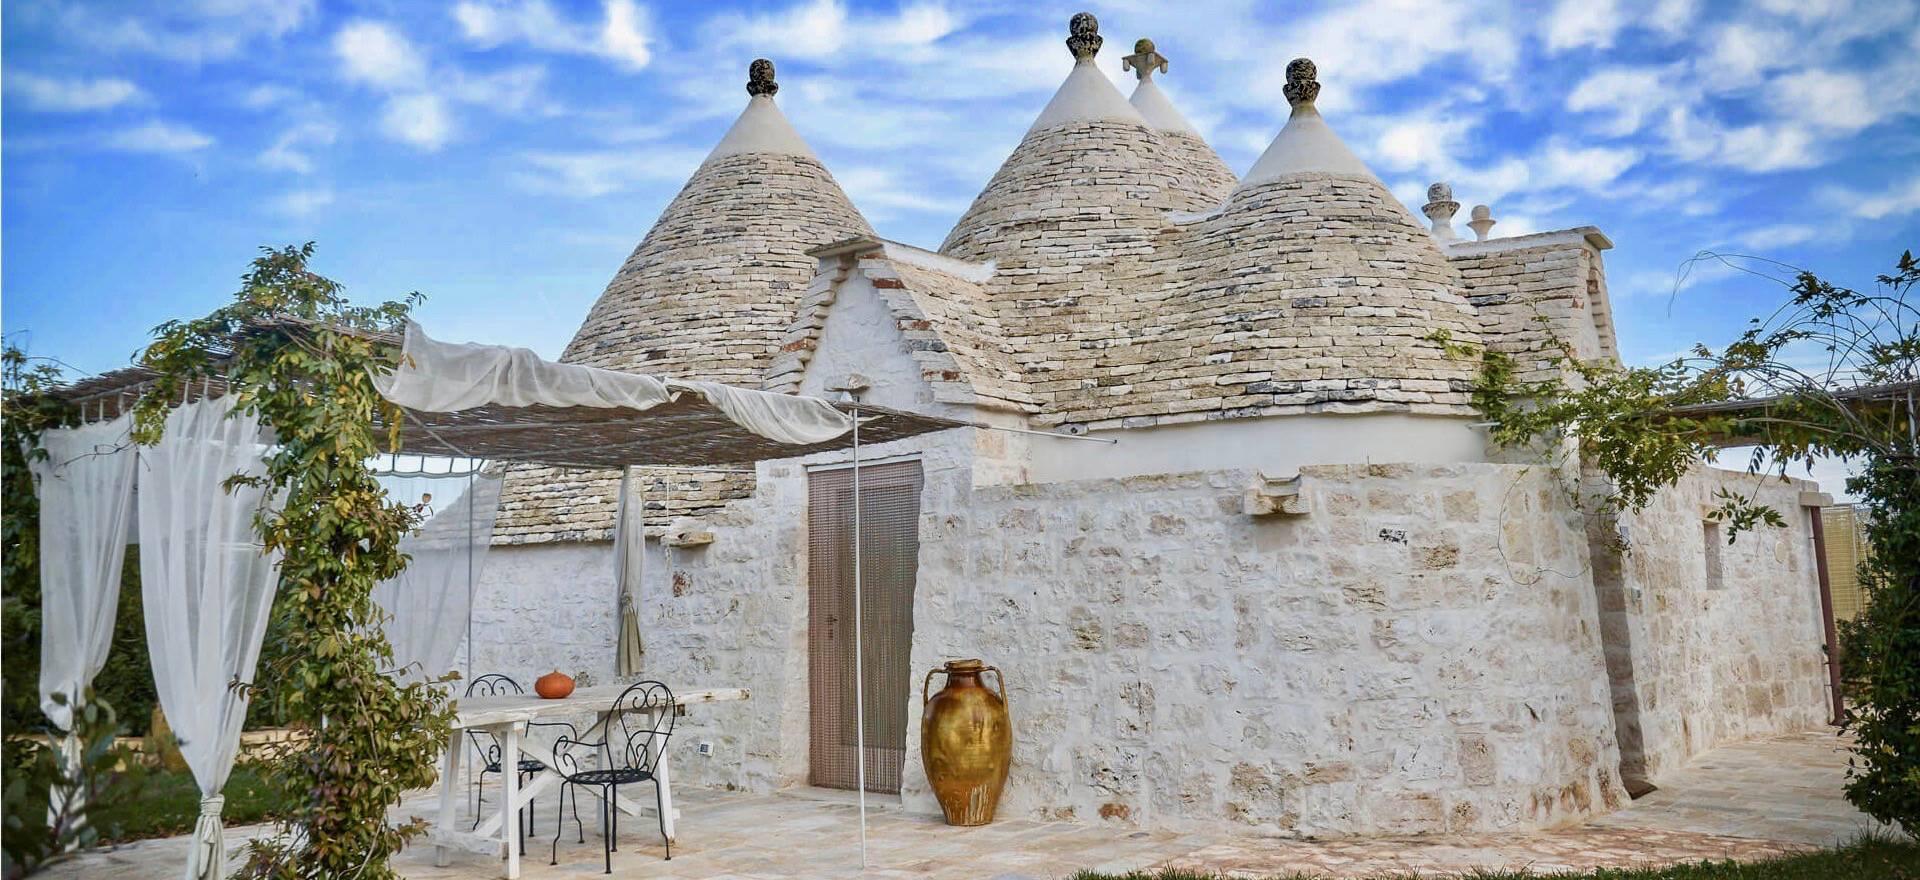 Agriturismo Puglia Zuid Italiaanse gastvrijheid in prachtige trulli